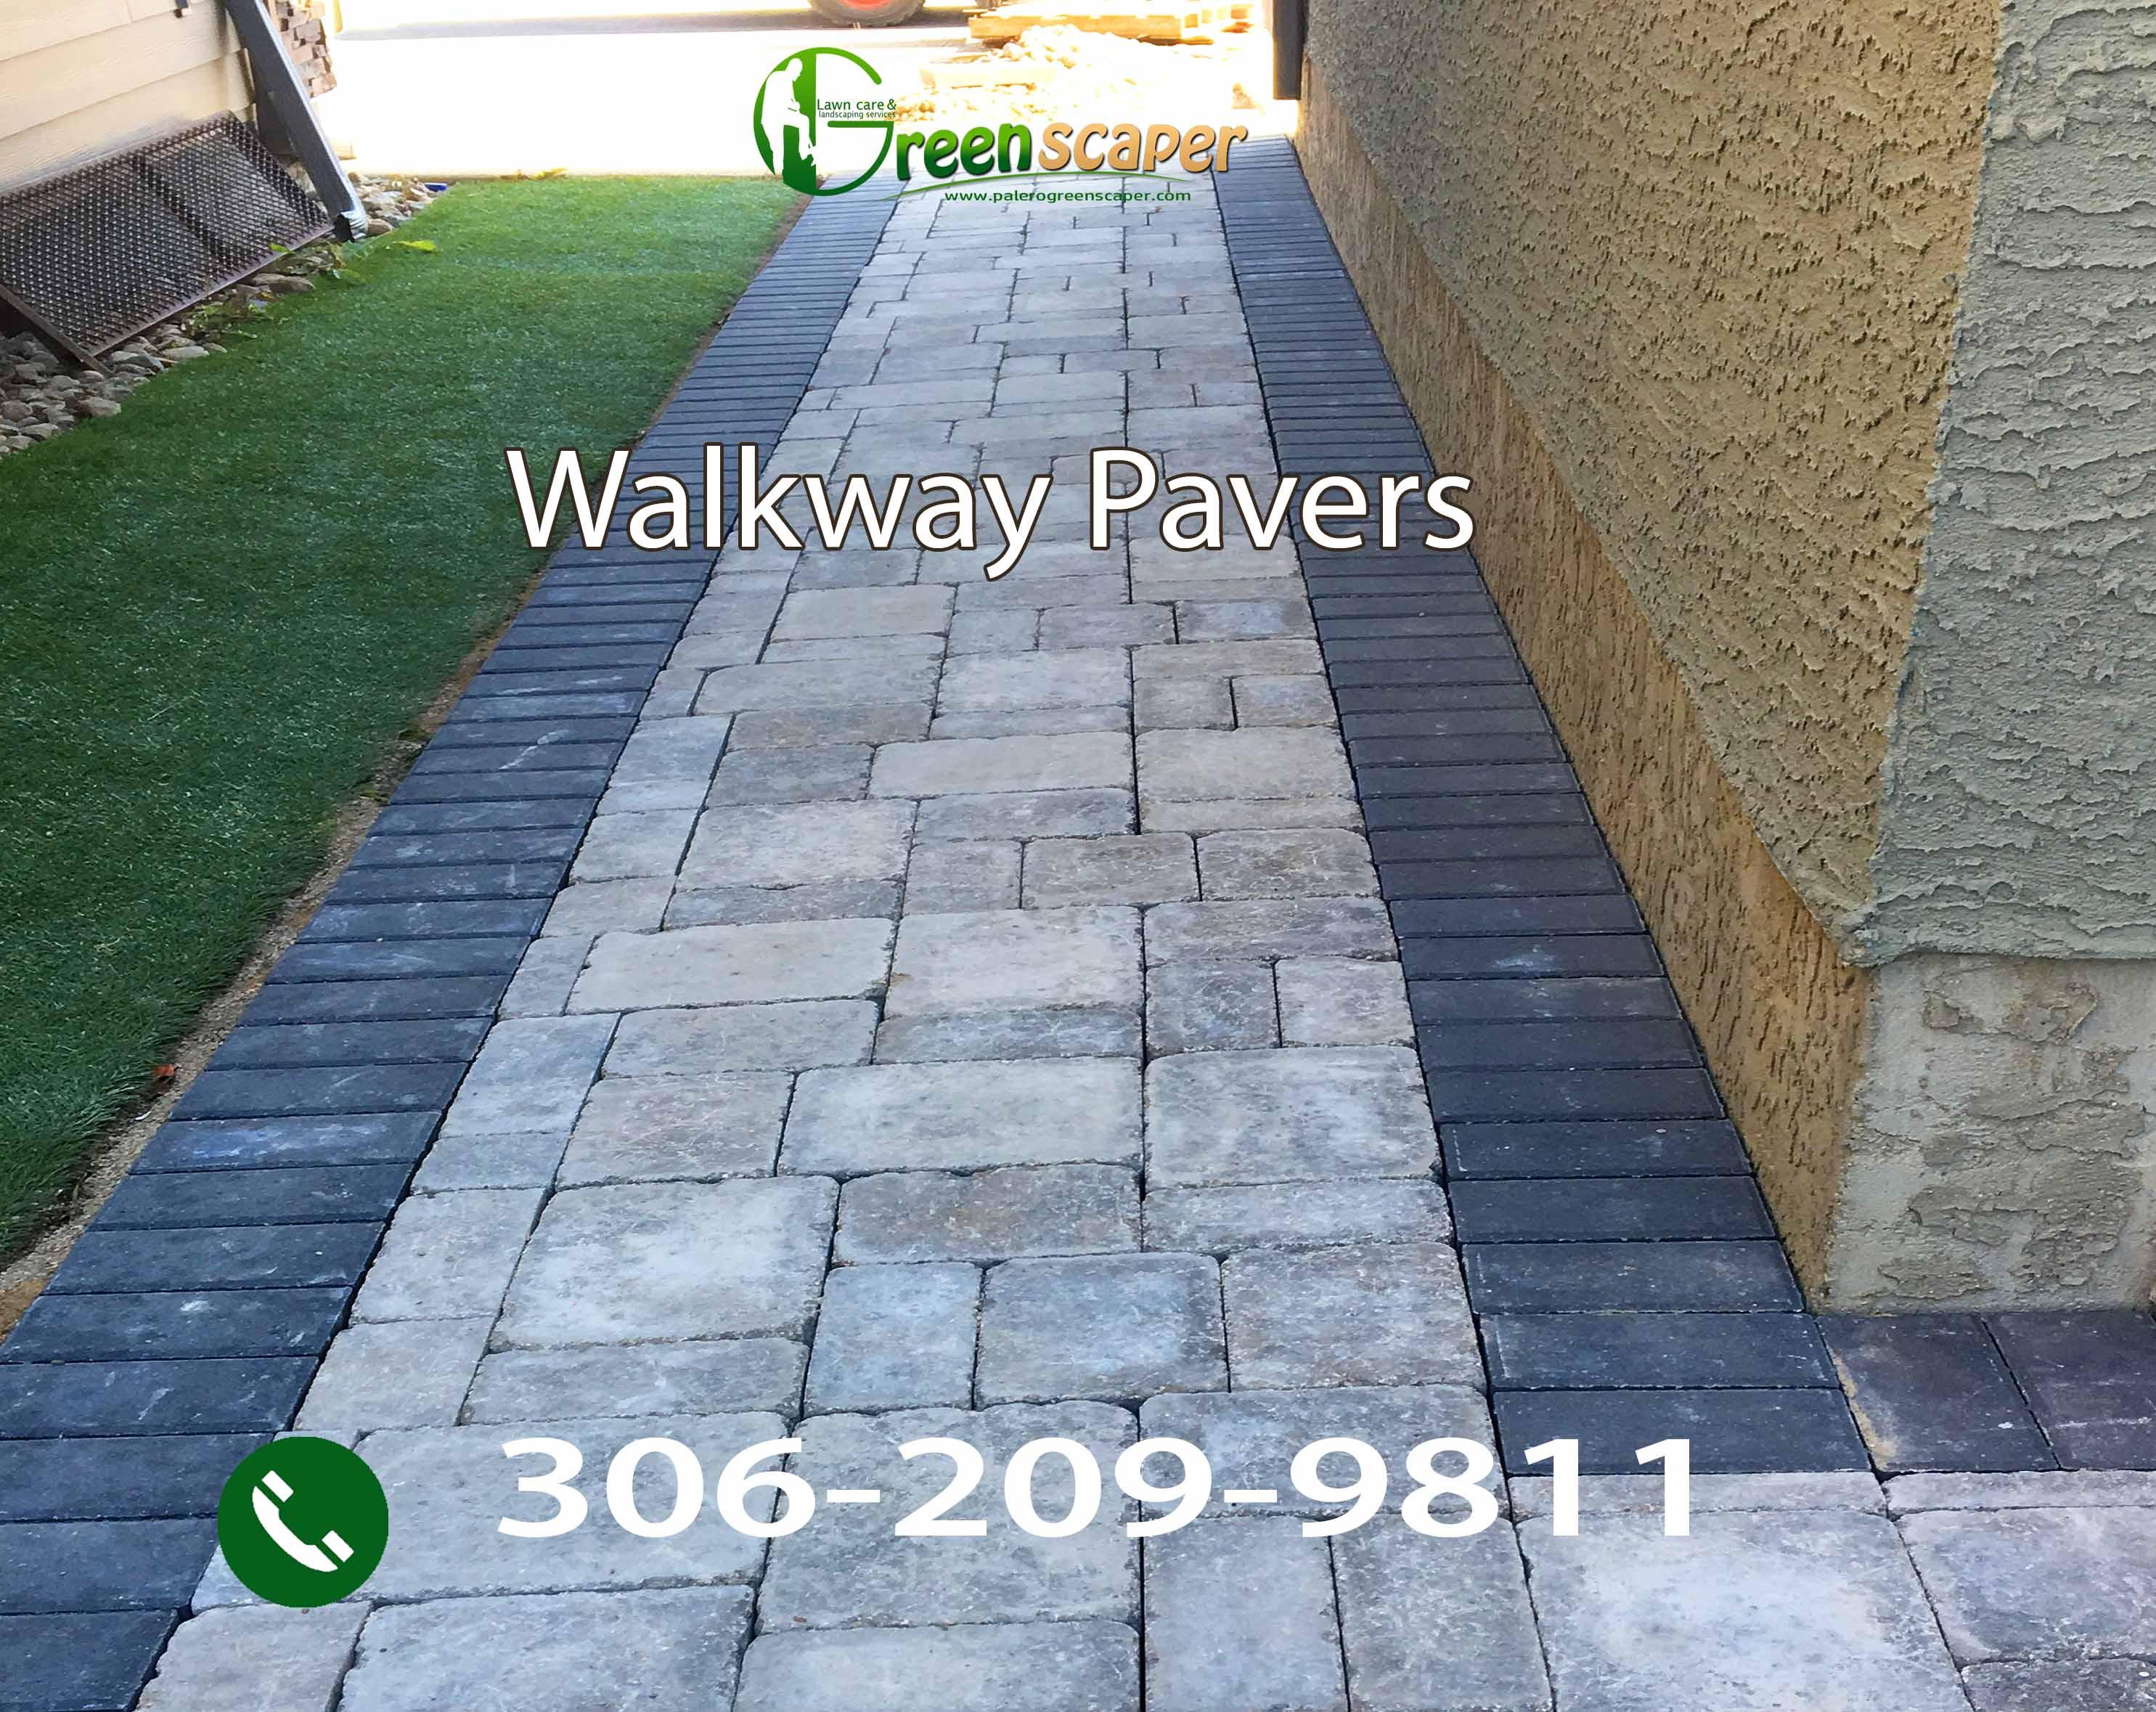 Good Walkway Pavers Regina. Outdoor_pavers_regina01082018.  Residential_landscape_ideas_Regina05182018.  Outdoor_landscaping_Service_Regina05182018